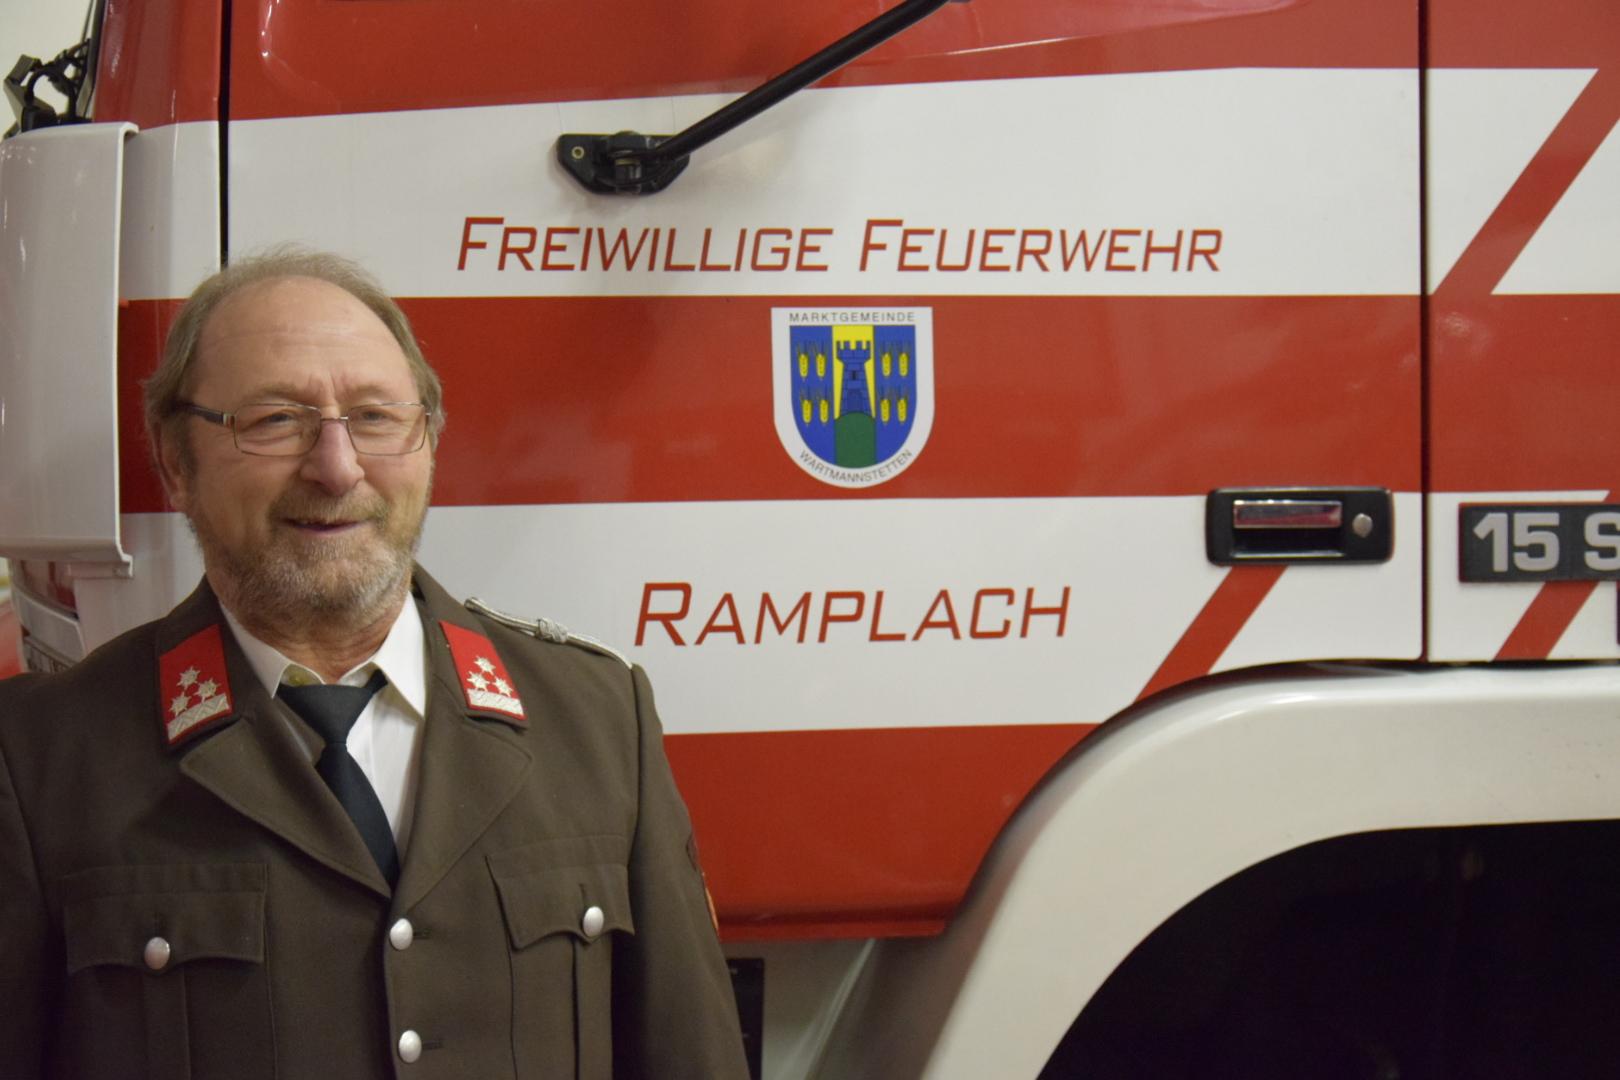 HLM Karl Weißenböck